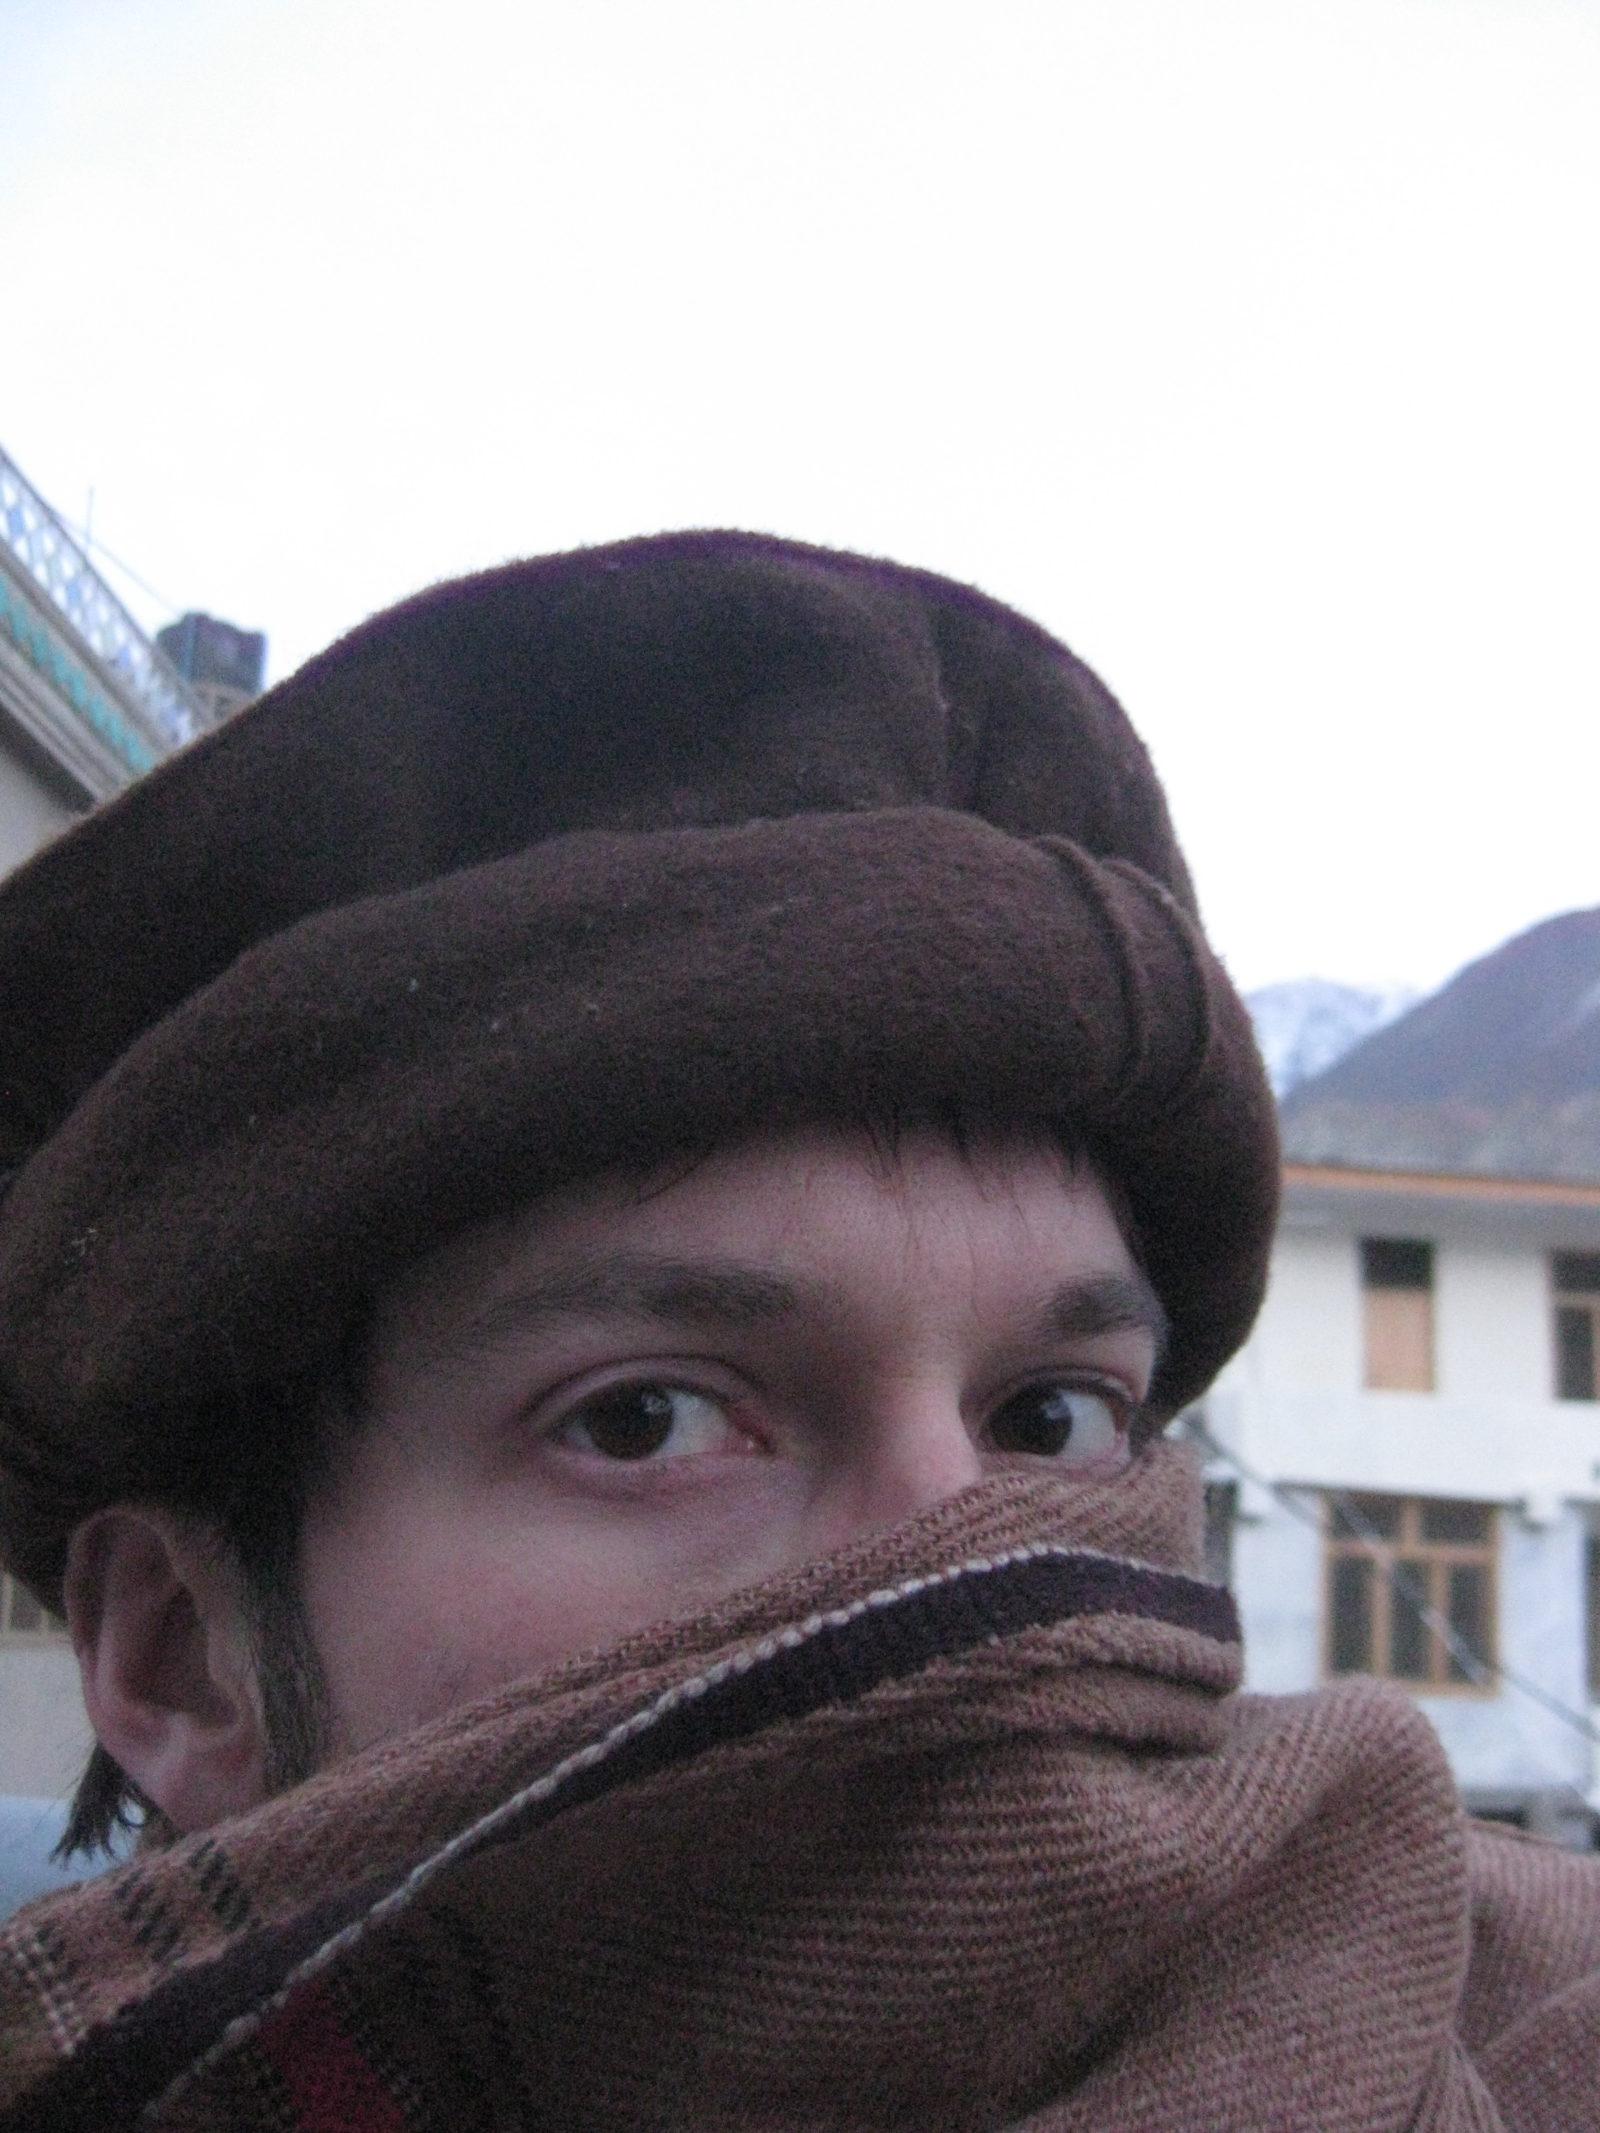 Into the Pakistani Himalaya Mountains!